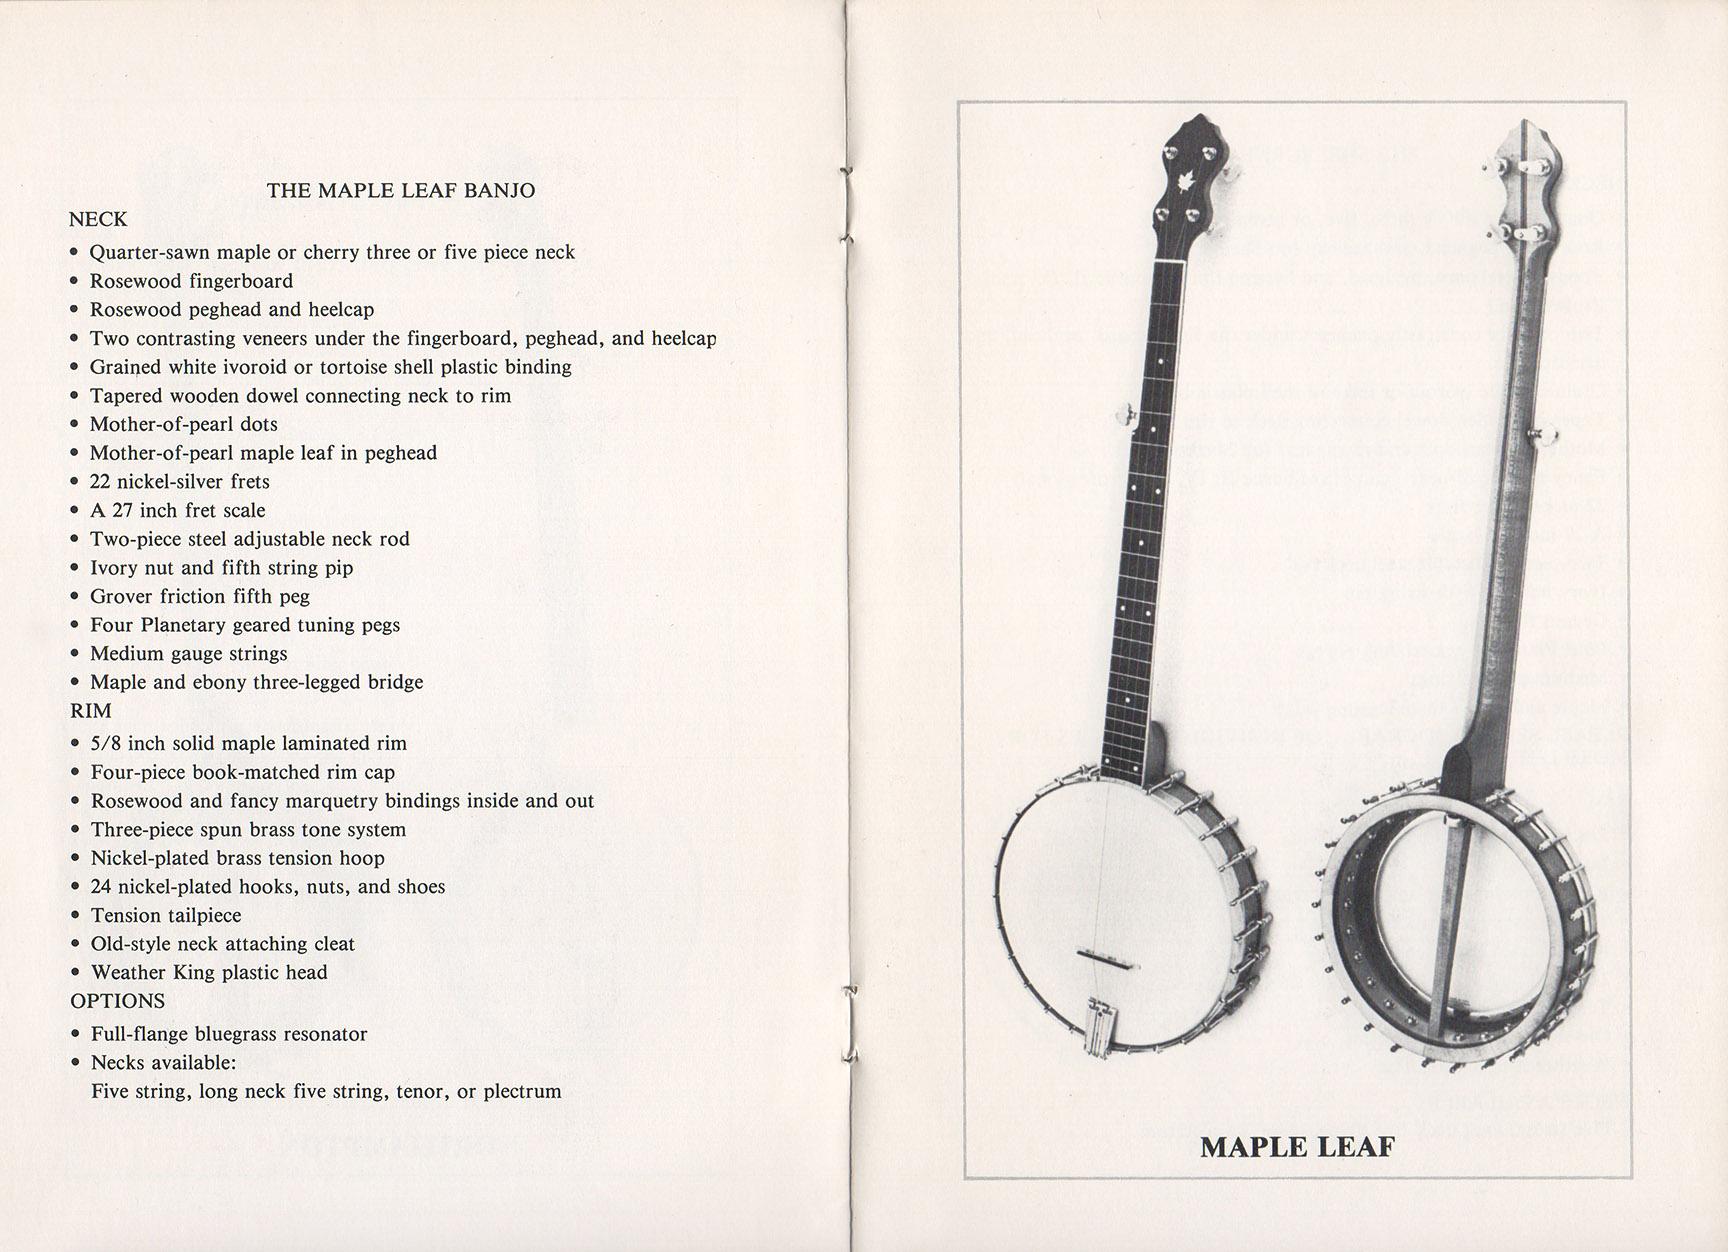 A E Smith Banjo Company Catalog page 3